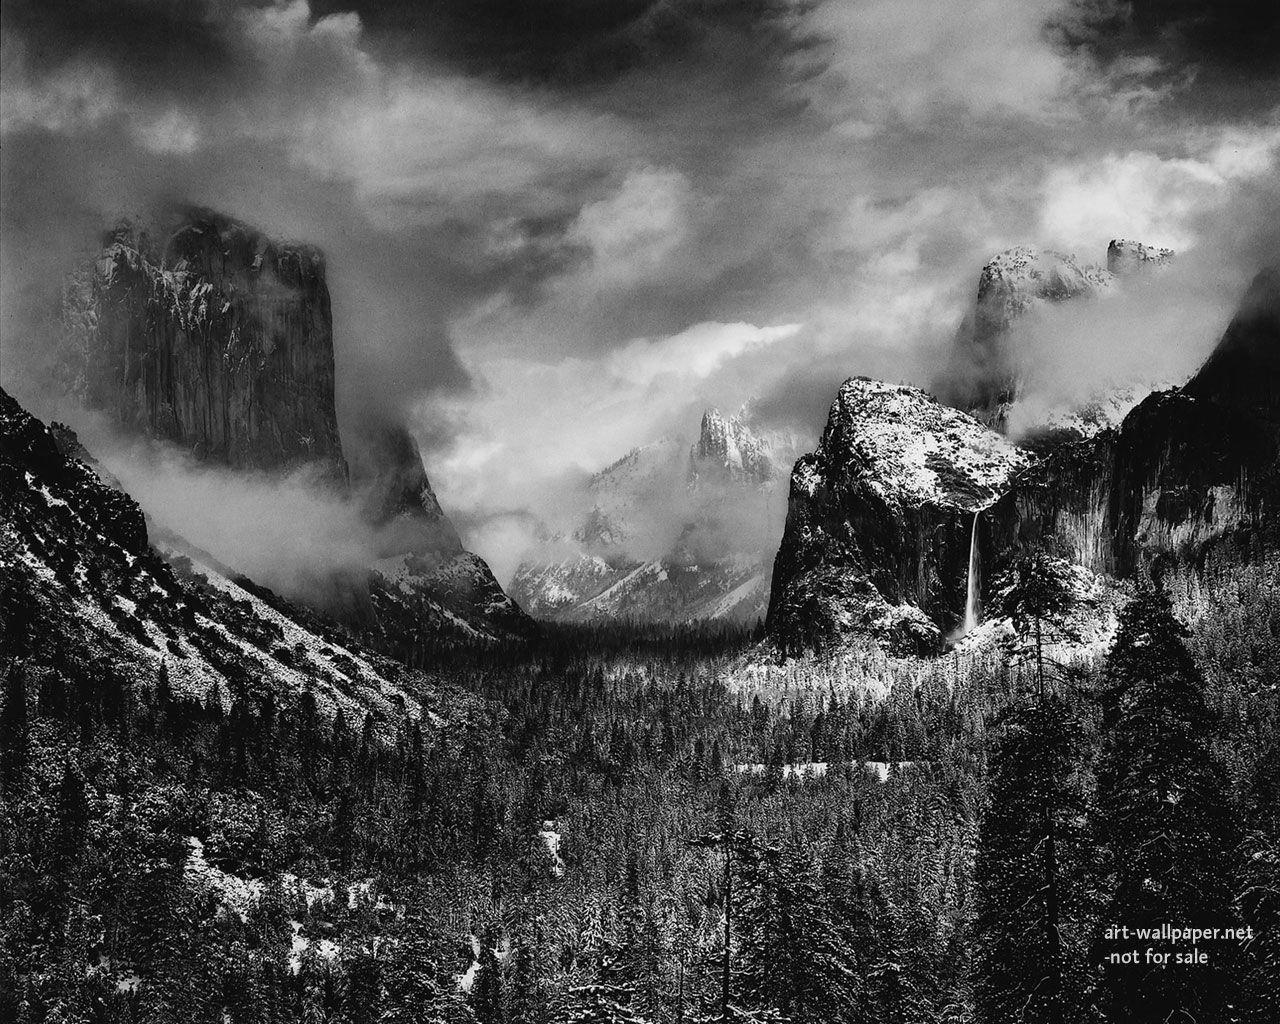 Ansel Adams Photography | Adam West Ansel Adams Photos Photography ...